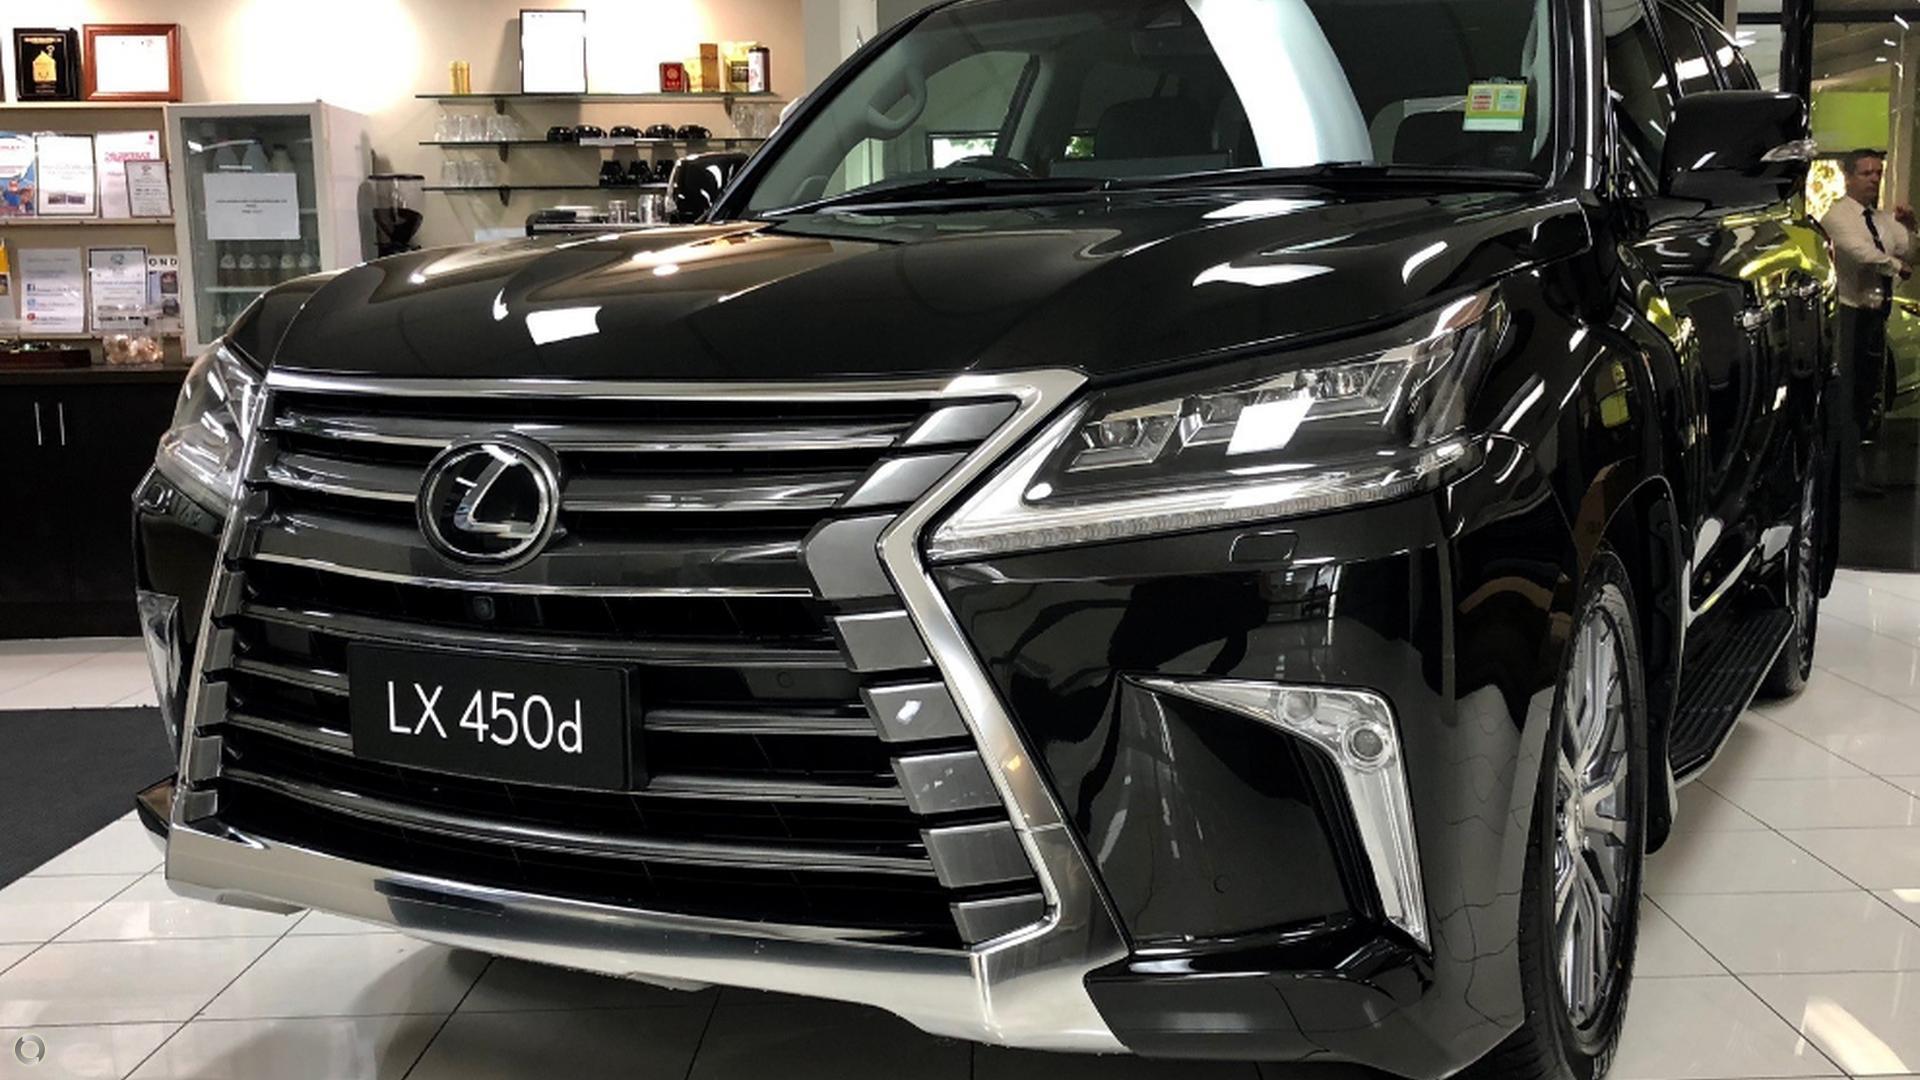 2018 Lexus Lx450d  VDJ201R